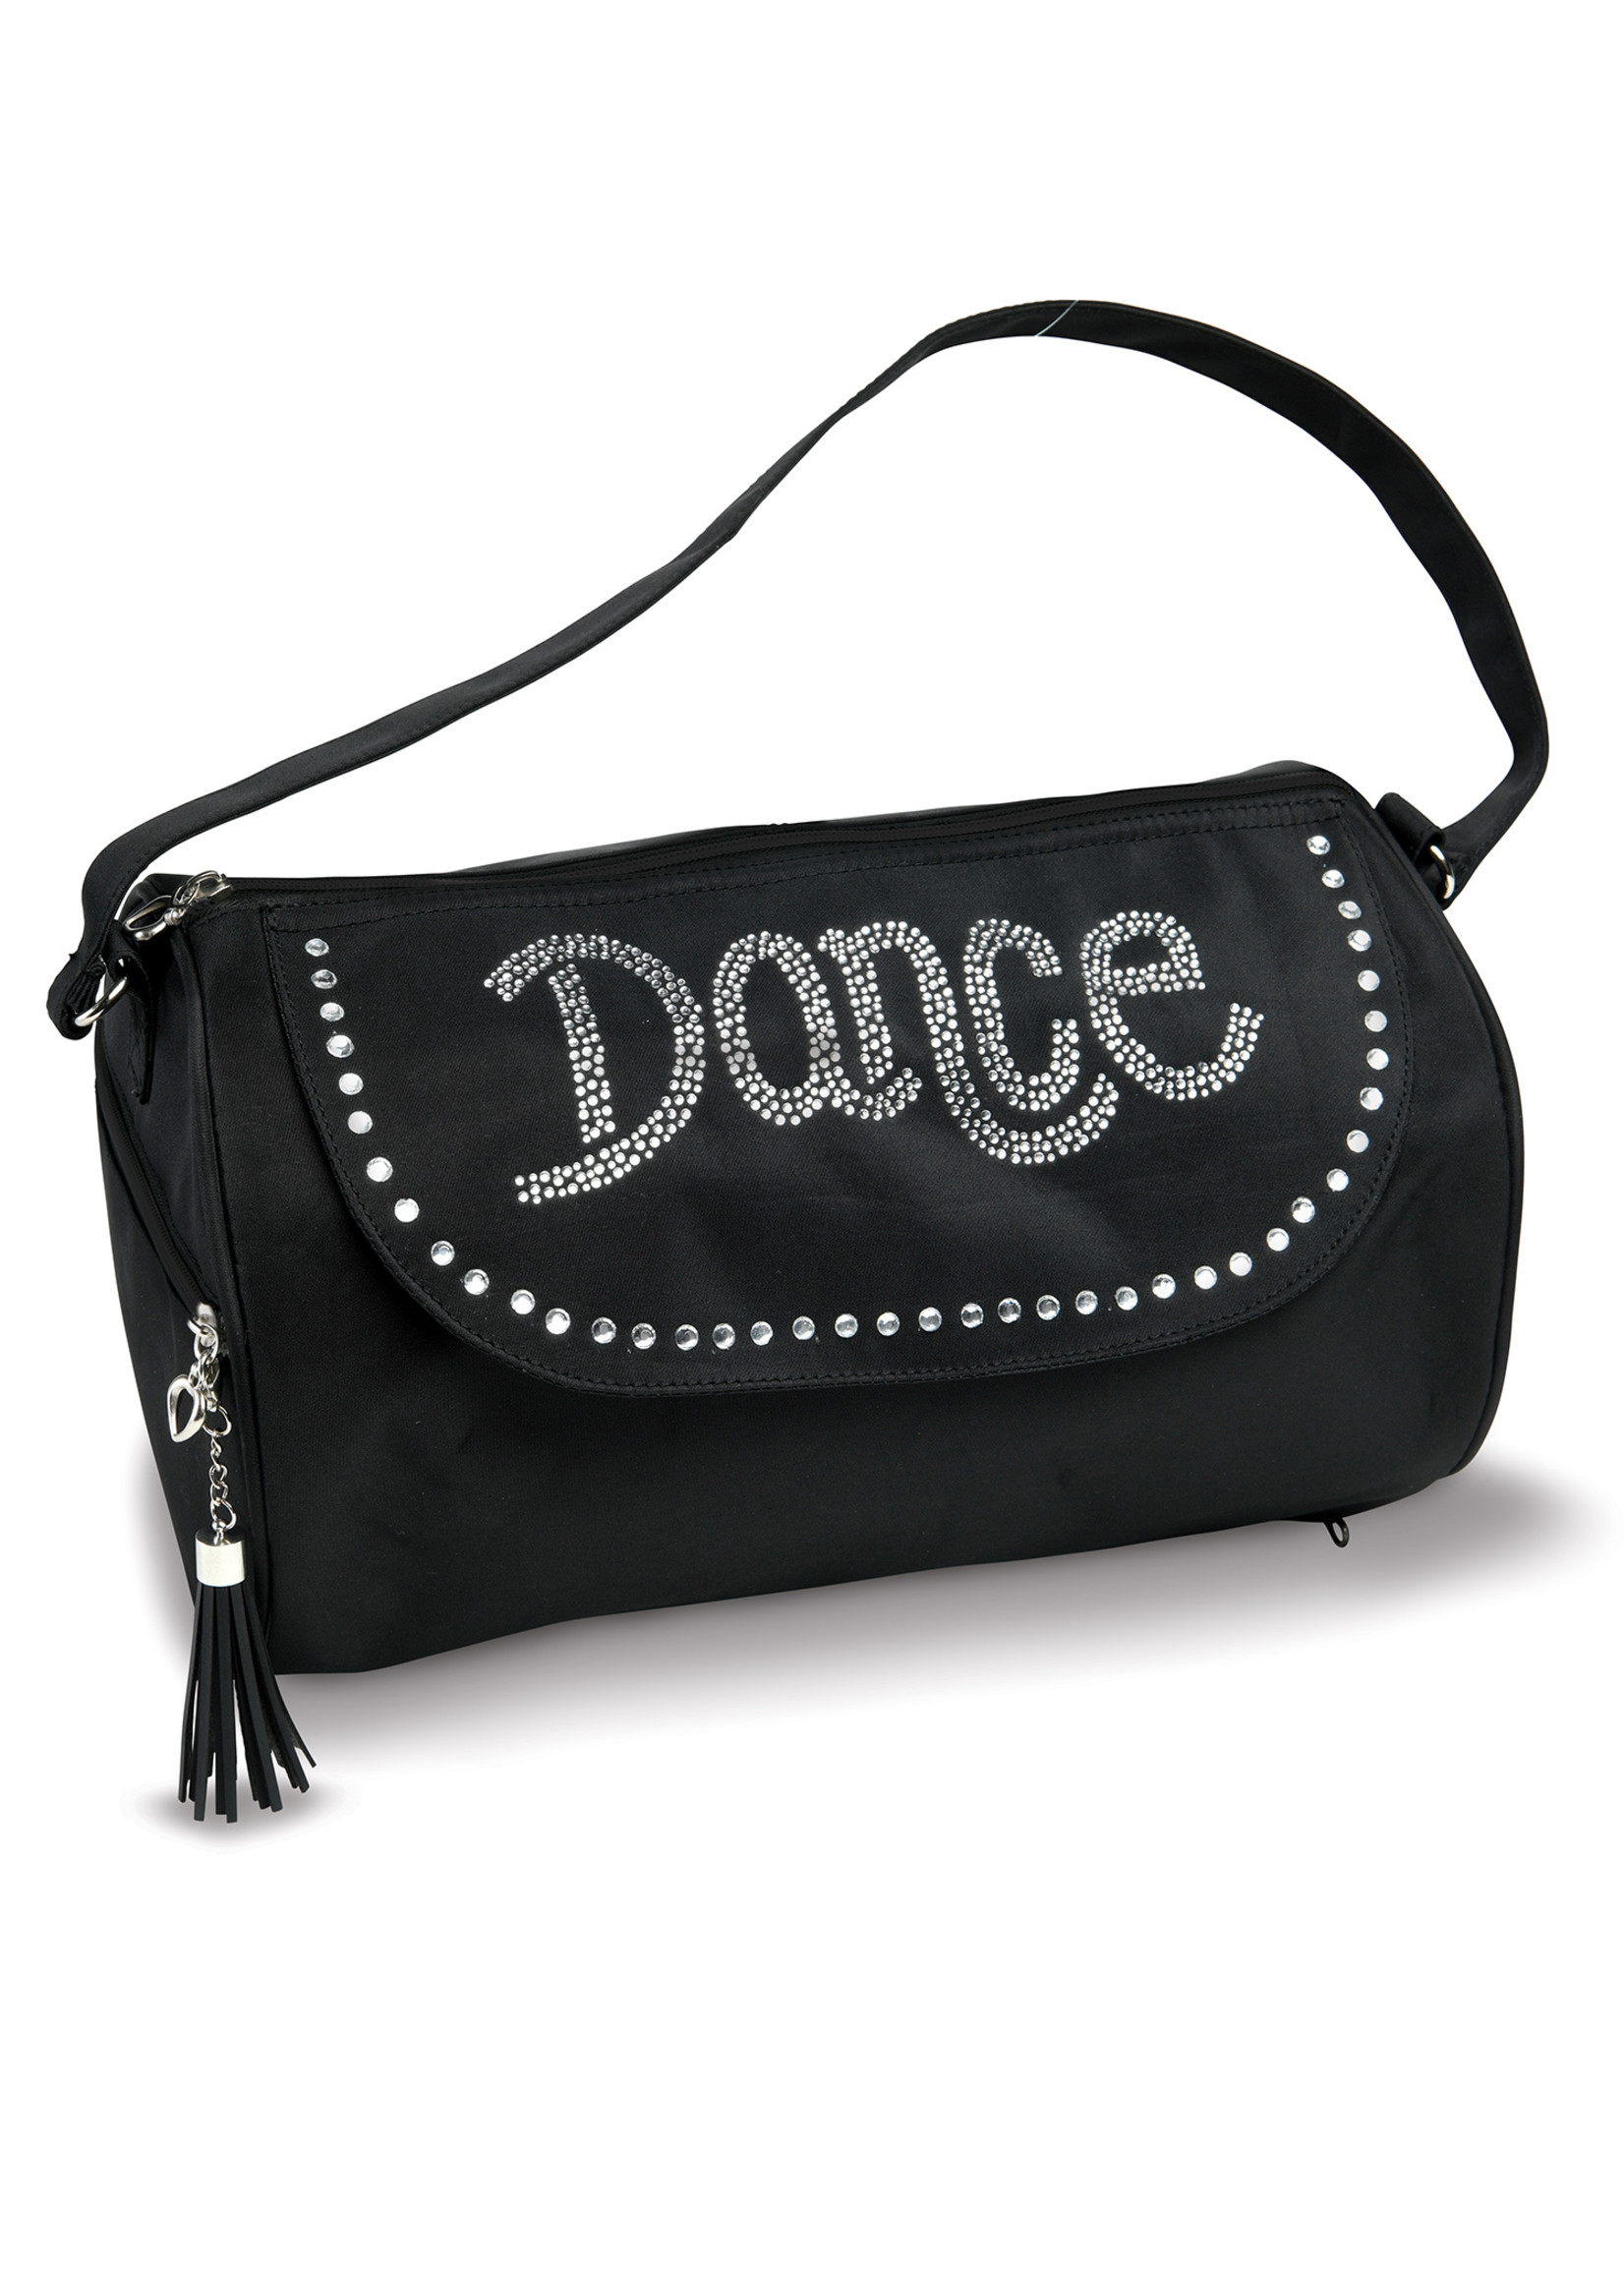 Danshuz Sac noir avec pierres du Rhin « Dance » - Dansbagz B840